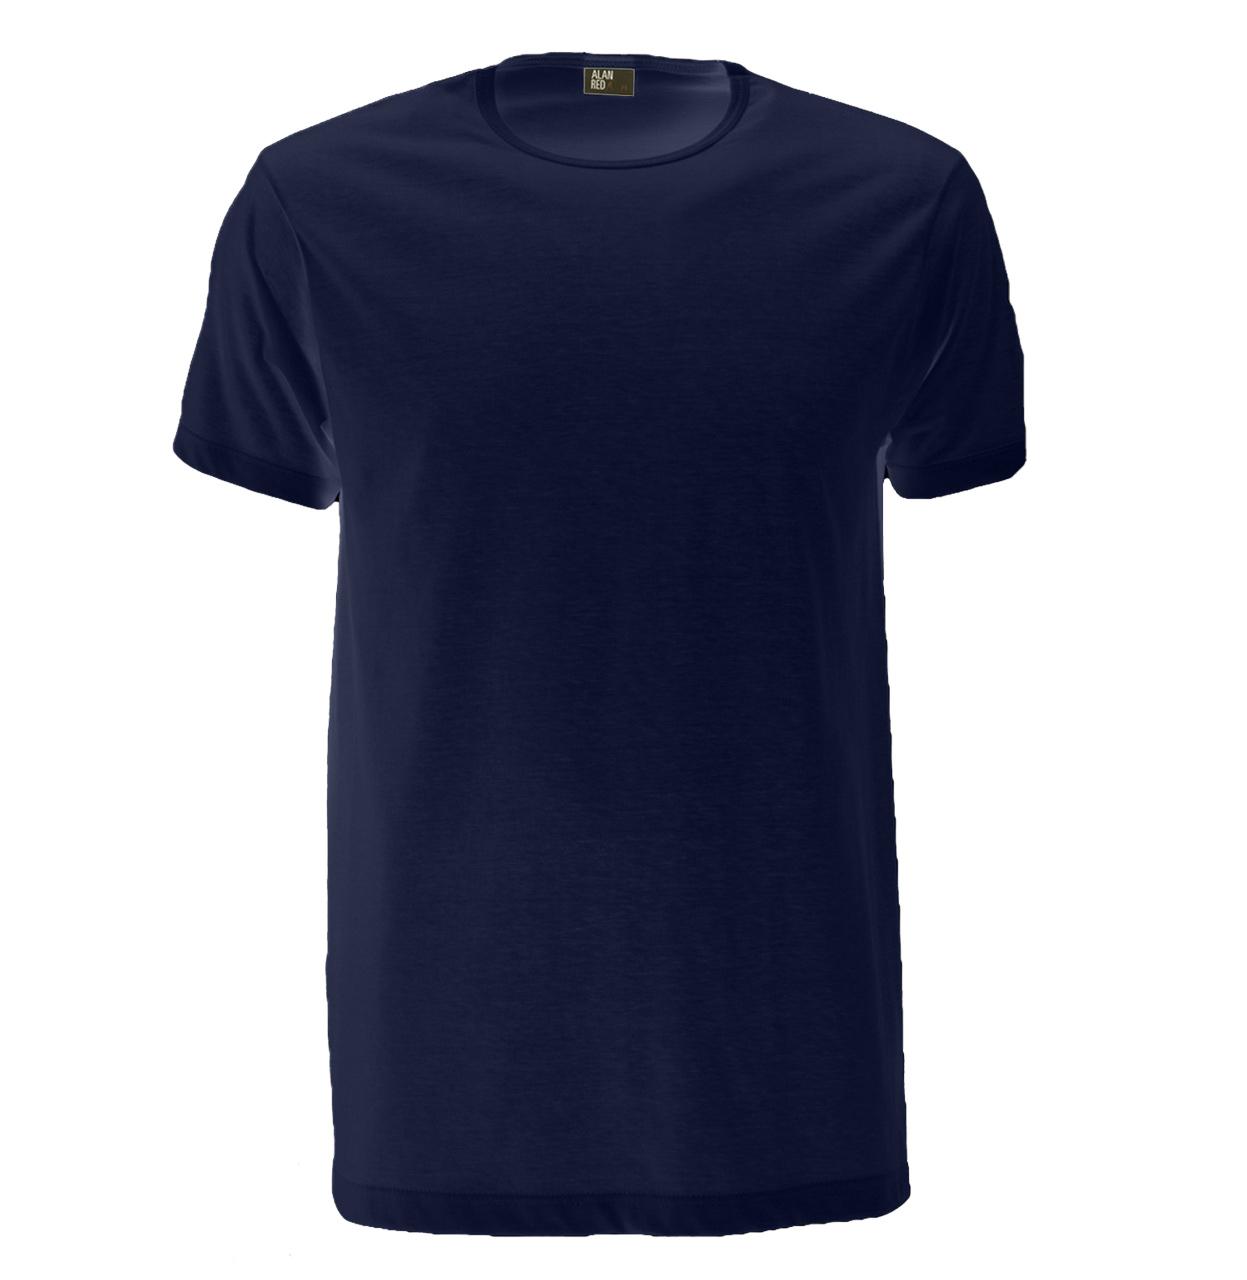 Alan Red T-shirt DERBY 1-PACK 06 DERBY 1-PACK marine Maat L